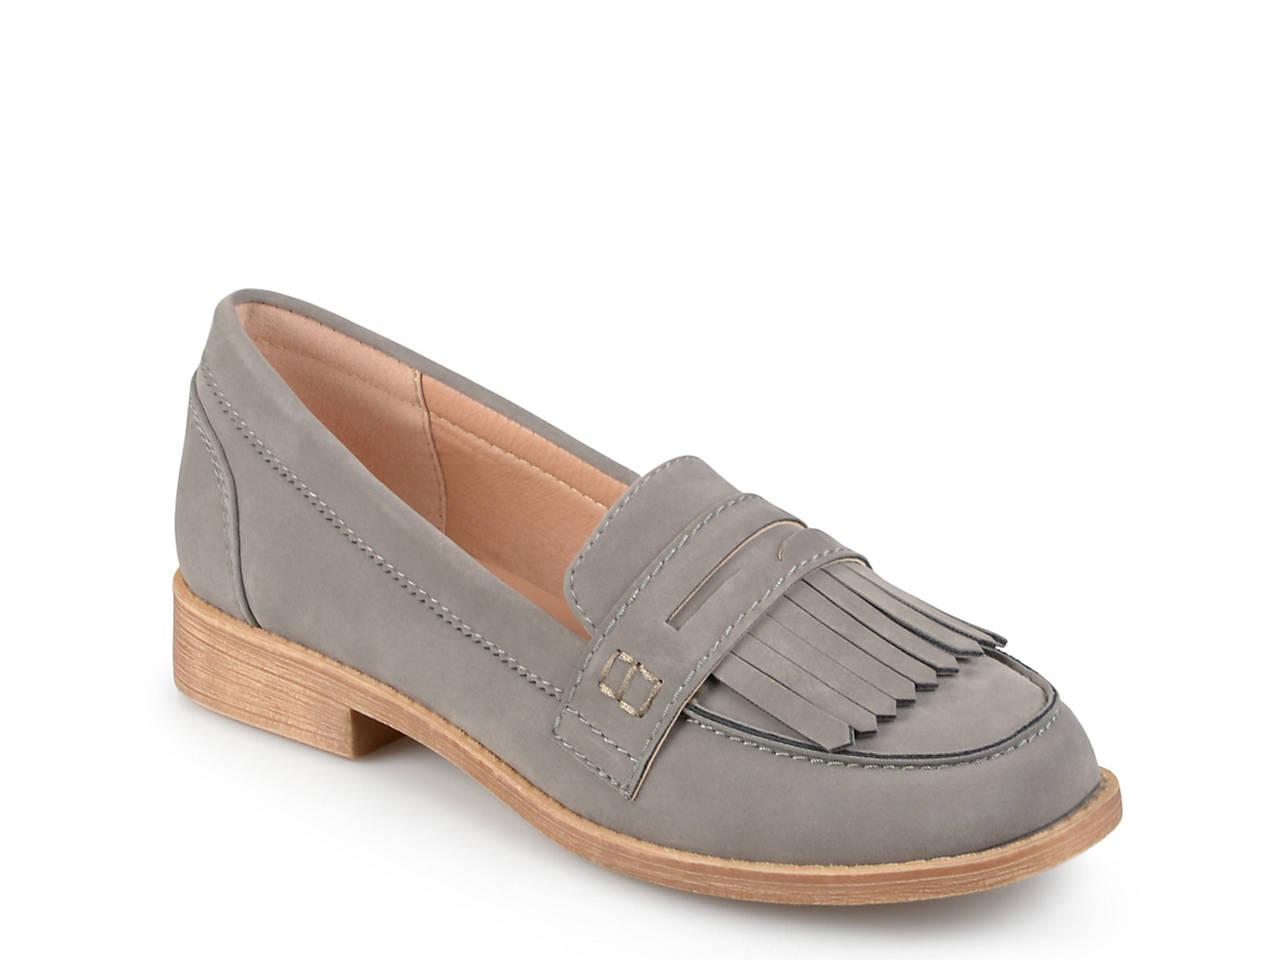 Journee Collection Larue ... Women's Heeled Loafers 540hKTgDdM